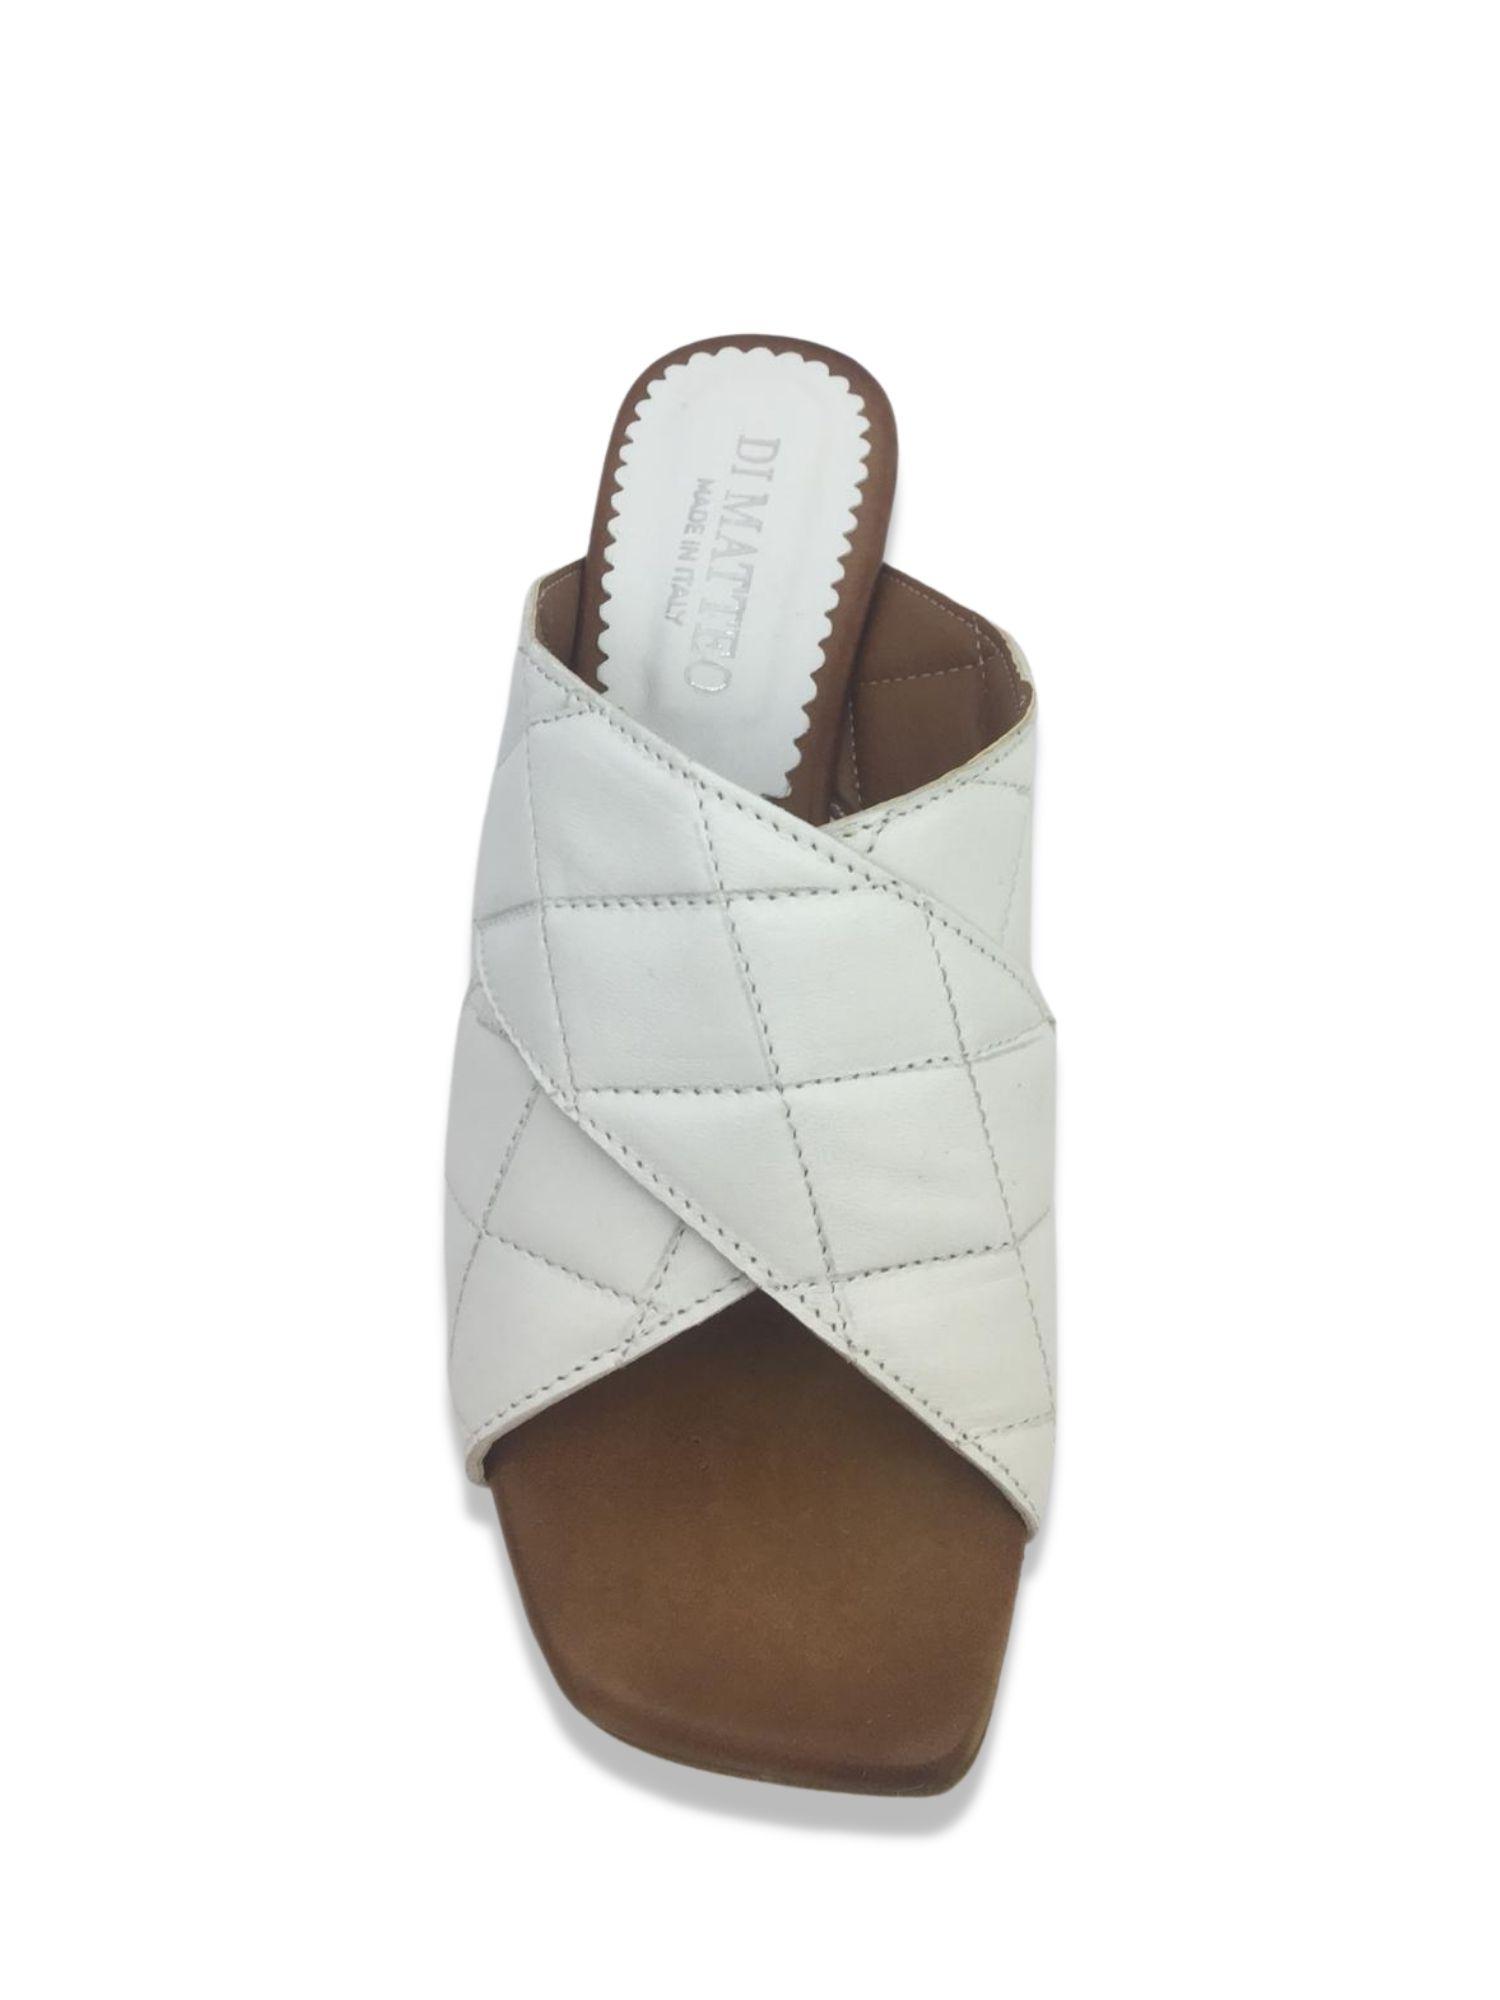 Sandalo scalzato Made in Italy 506 Bianco alto